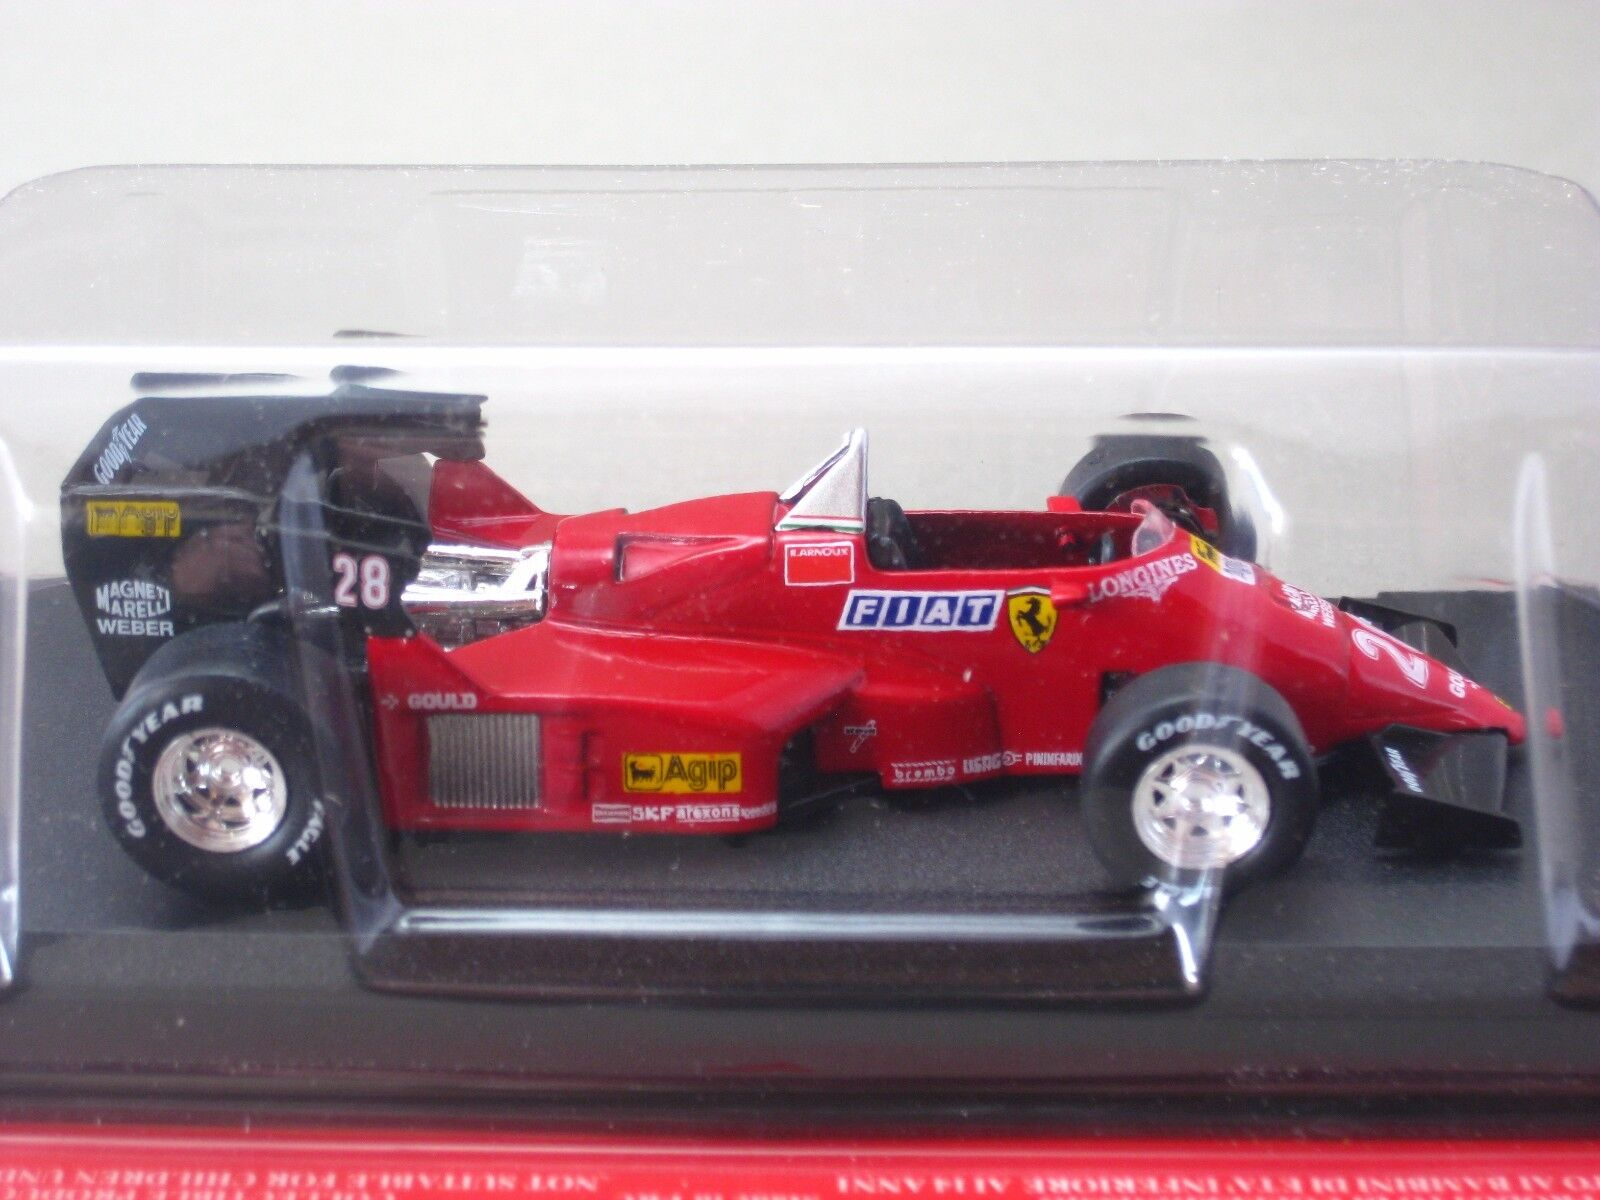 Ferrari 126 C4 Rene Arnoux 1984 Hachette 1 1 1 43 Diecast Modelo Coche Vol.42 72790d